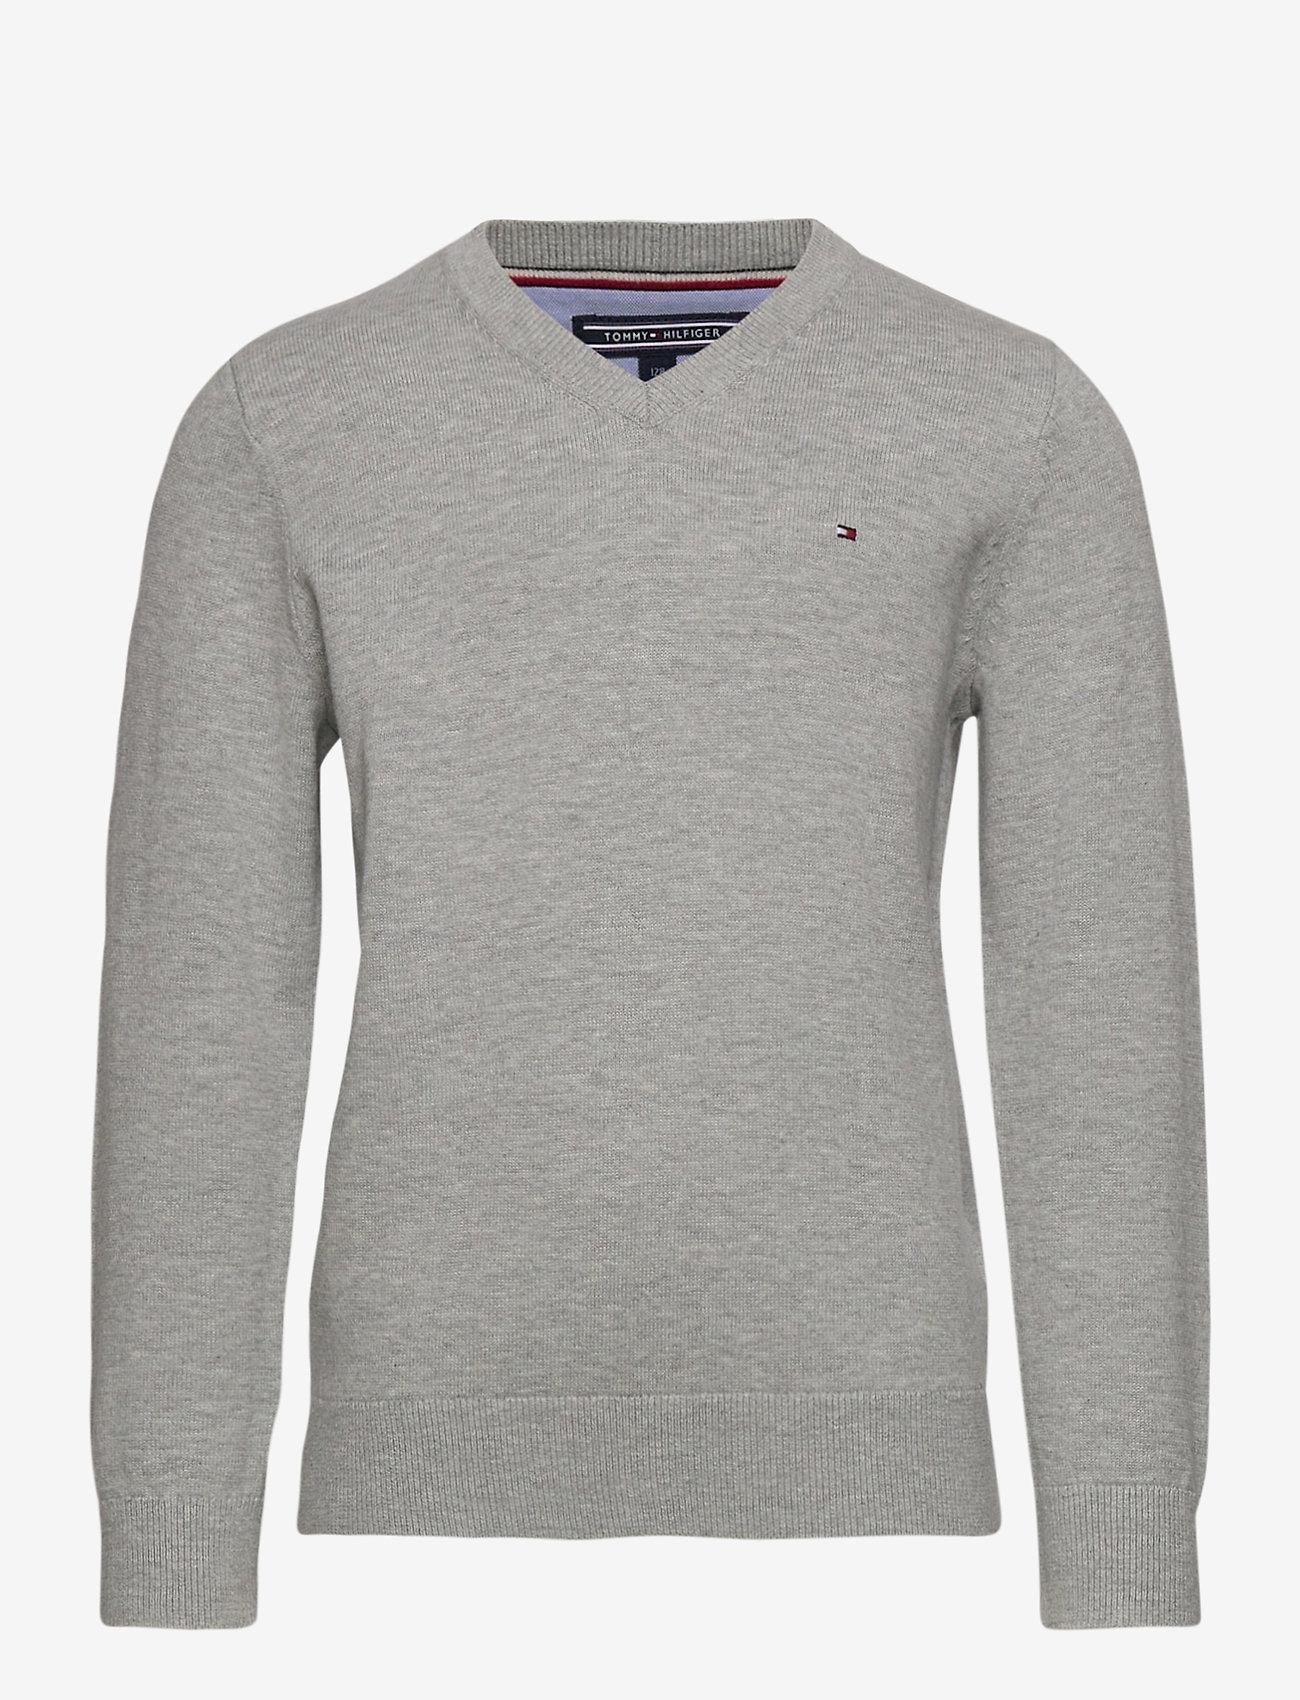 Tommy Hilfiger - BOYS BASIC V-NECK SWEATER - sweatshirts - grey heather - 0